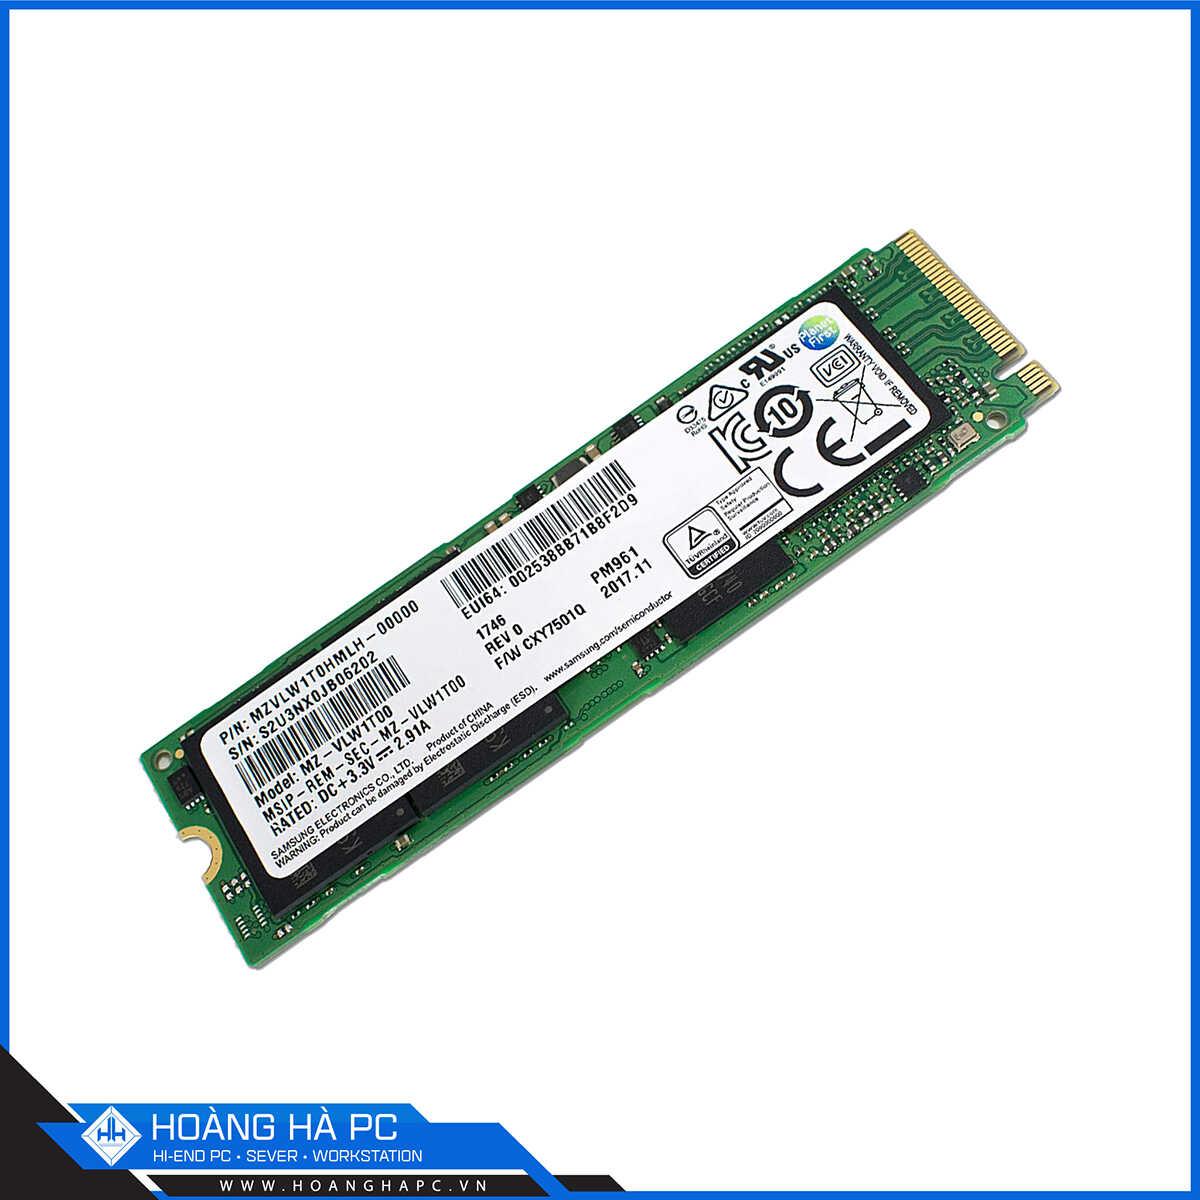 Samsung PM961 256GB M.2 2280